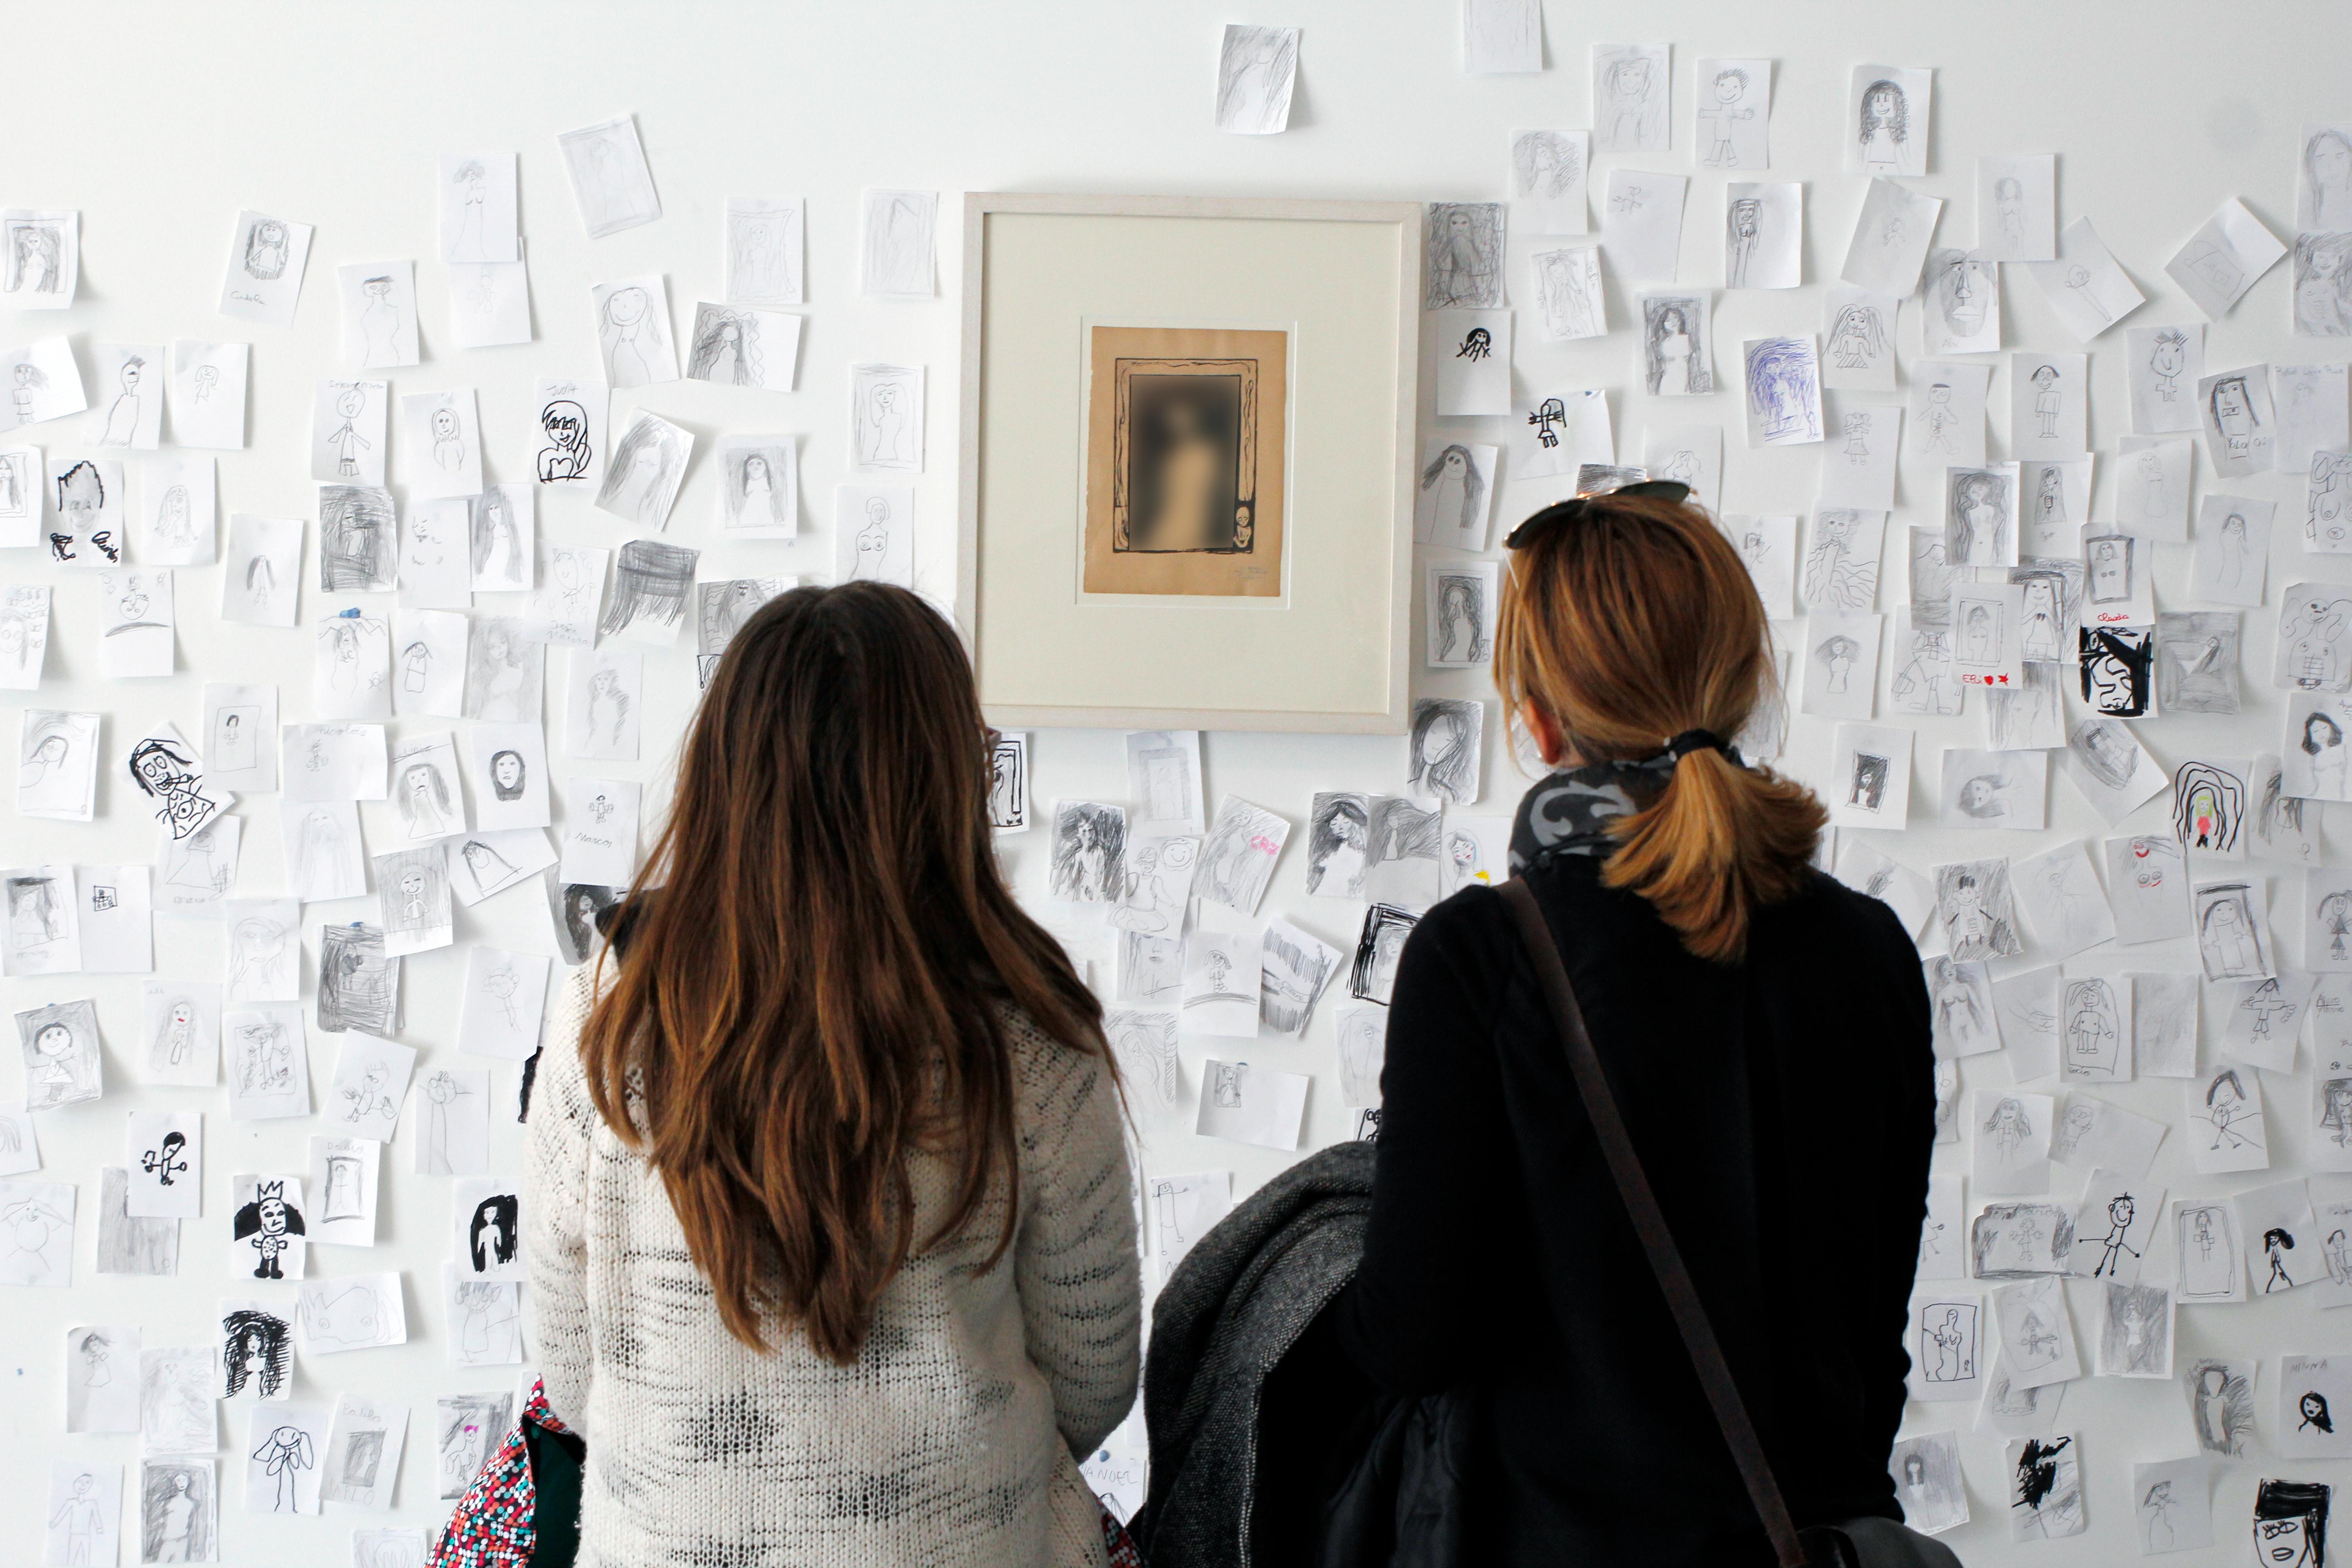 Cepeda, M. Á. 2015. Munch 2.